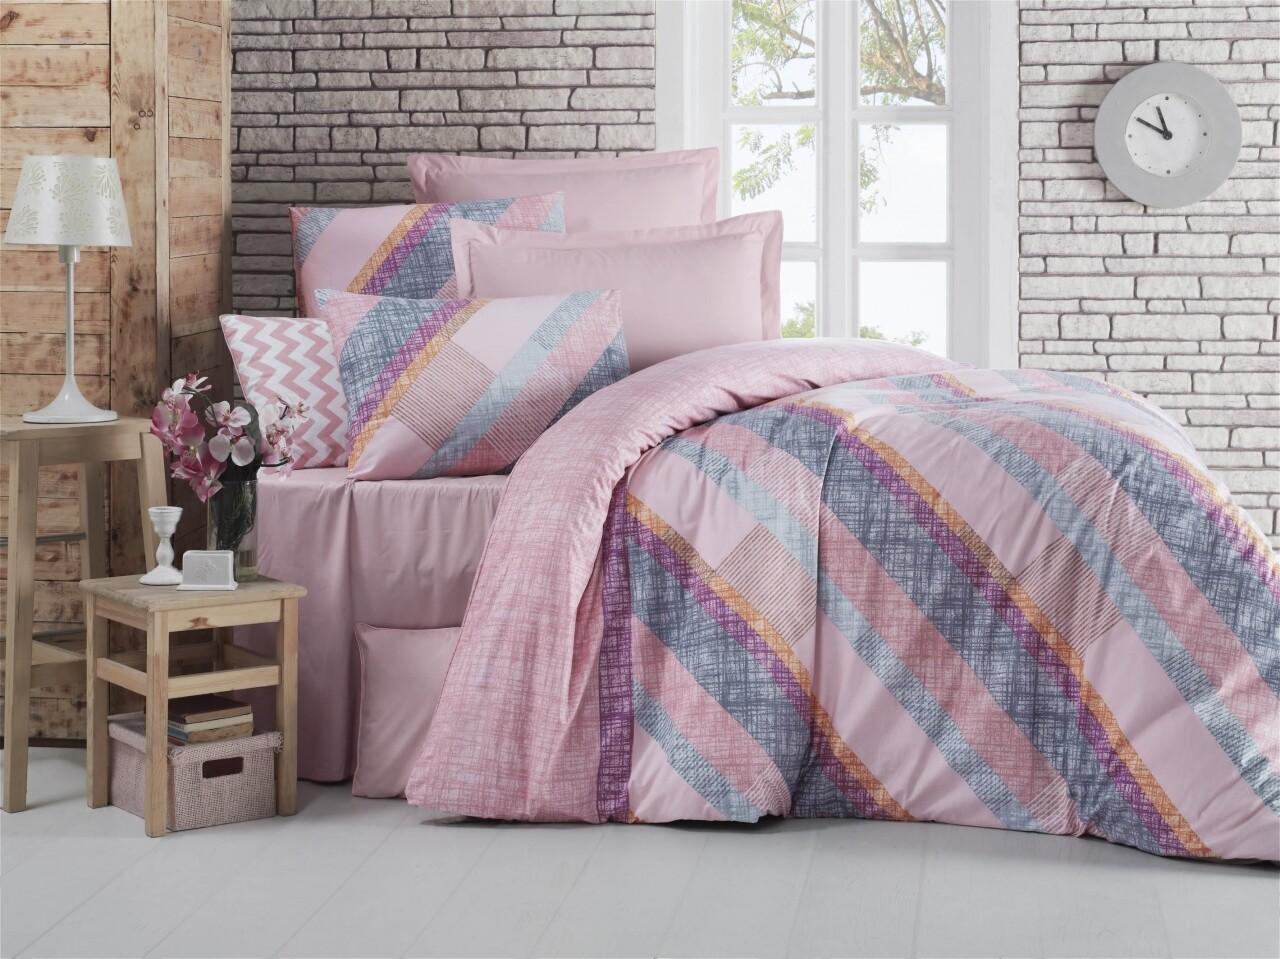 Lenjerie de pat pentru doua persoane, Jeu Bedora, 100%  bumbac, 6 piese